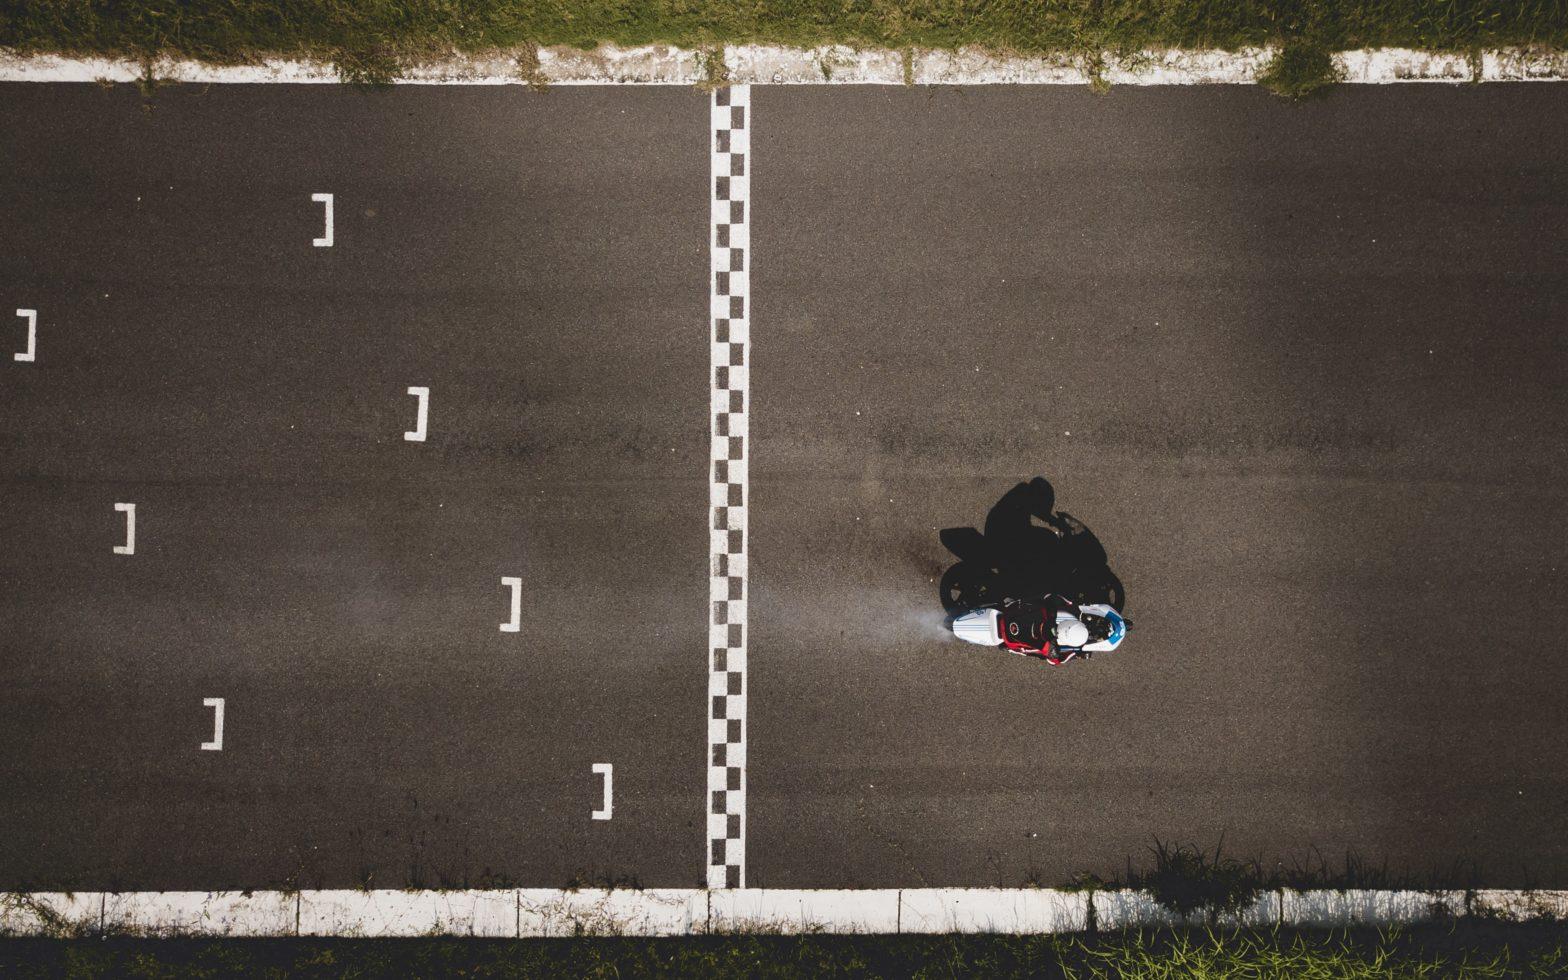 Finish line with motorbike